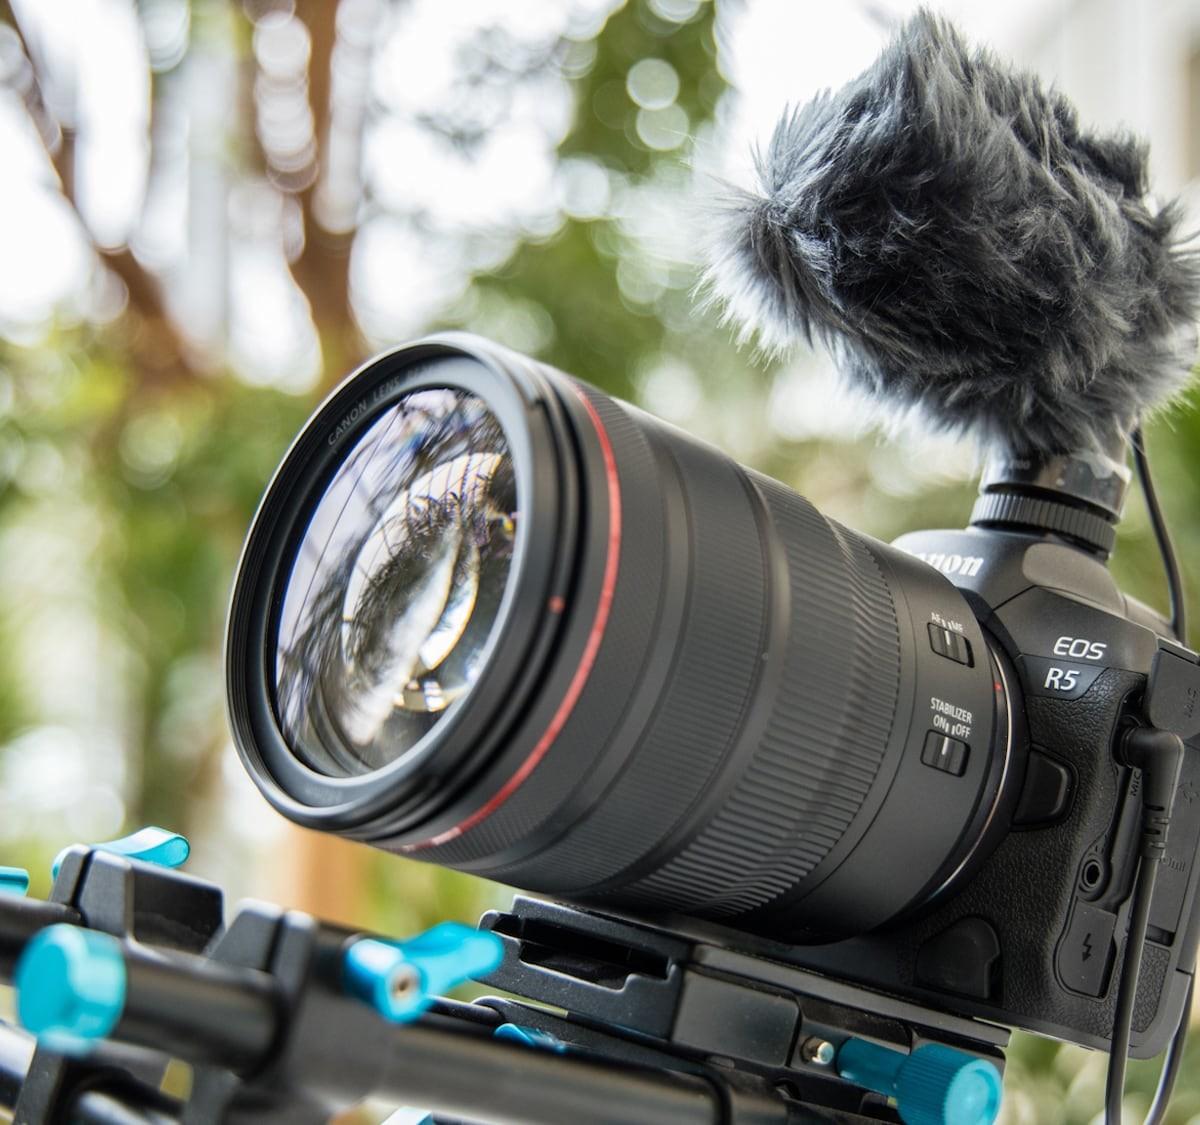 Canon EOS R5 Professional Mirrorless Camera offers 8K RAW internal video recording